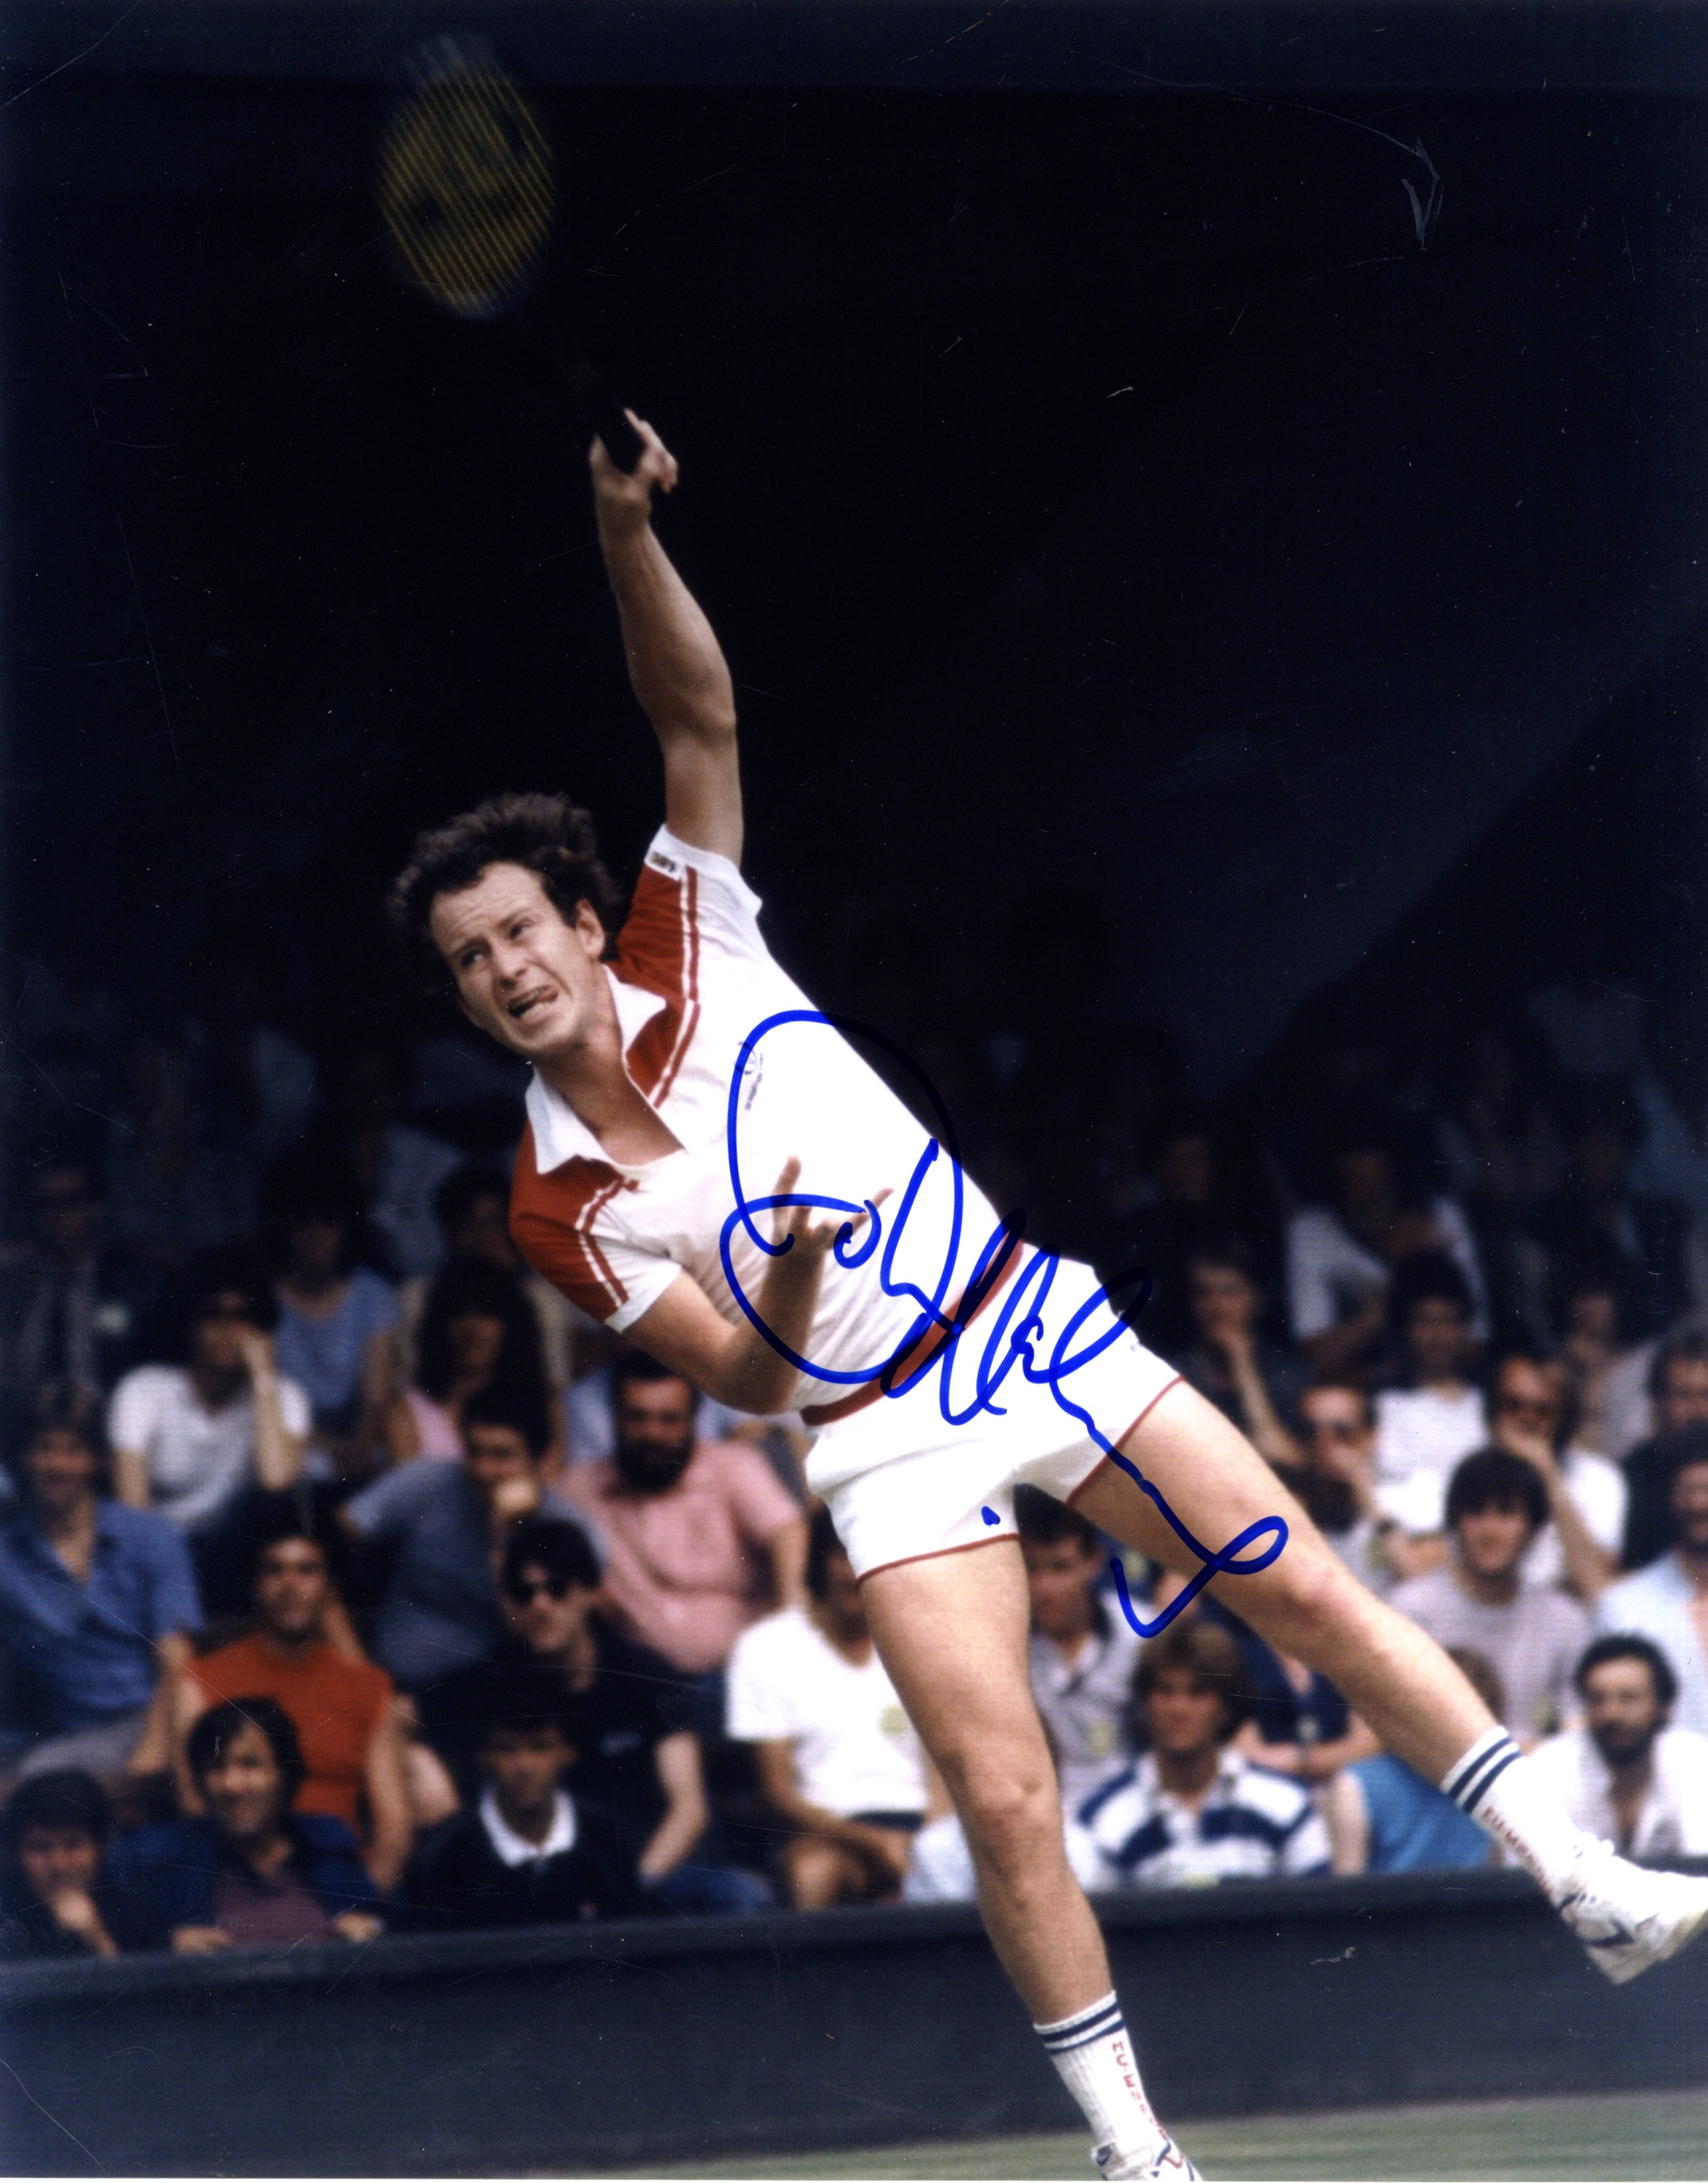 TENNIS John McEnroe 1959 American Tennis Player Wimbledon